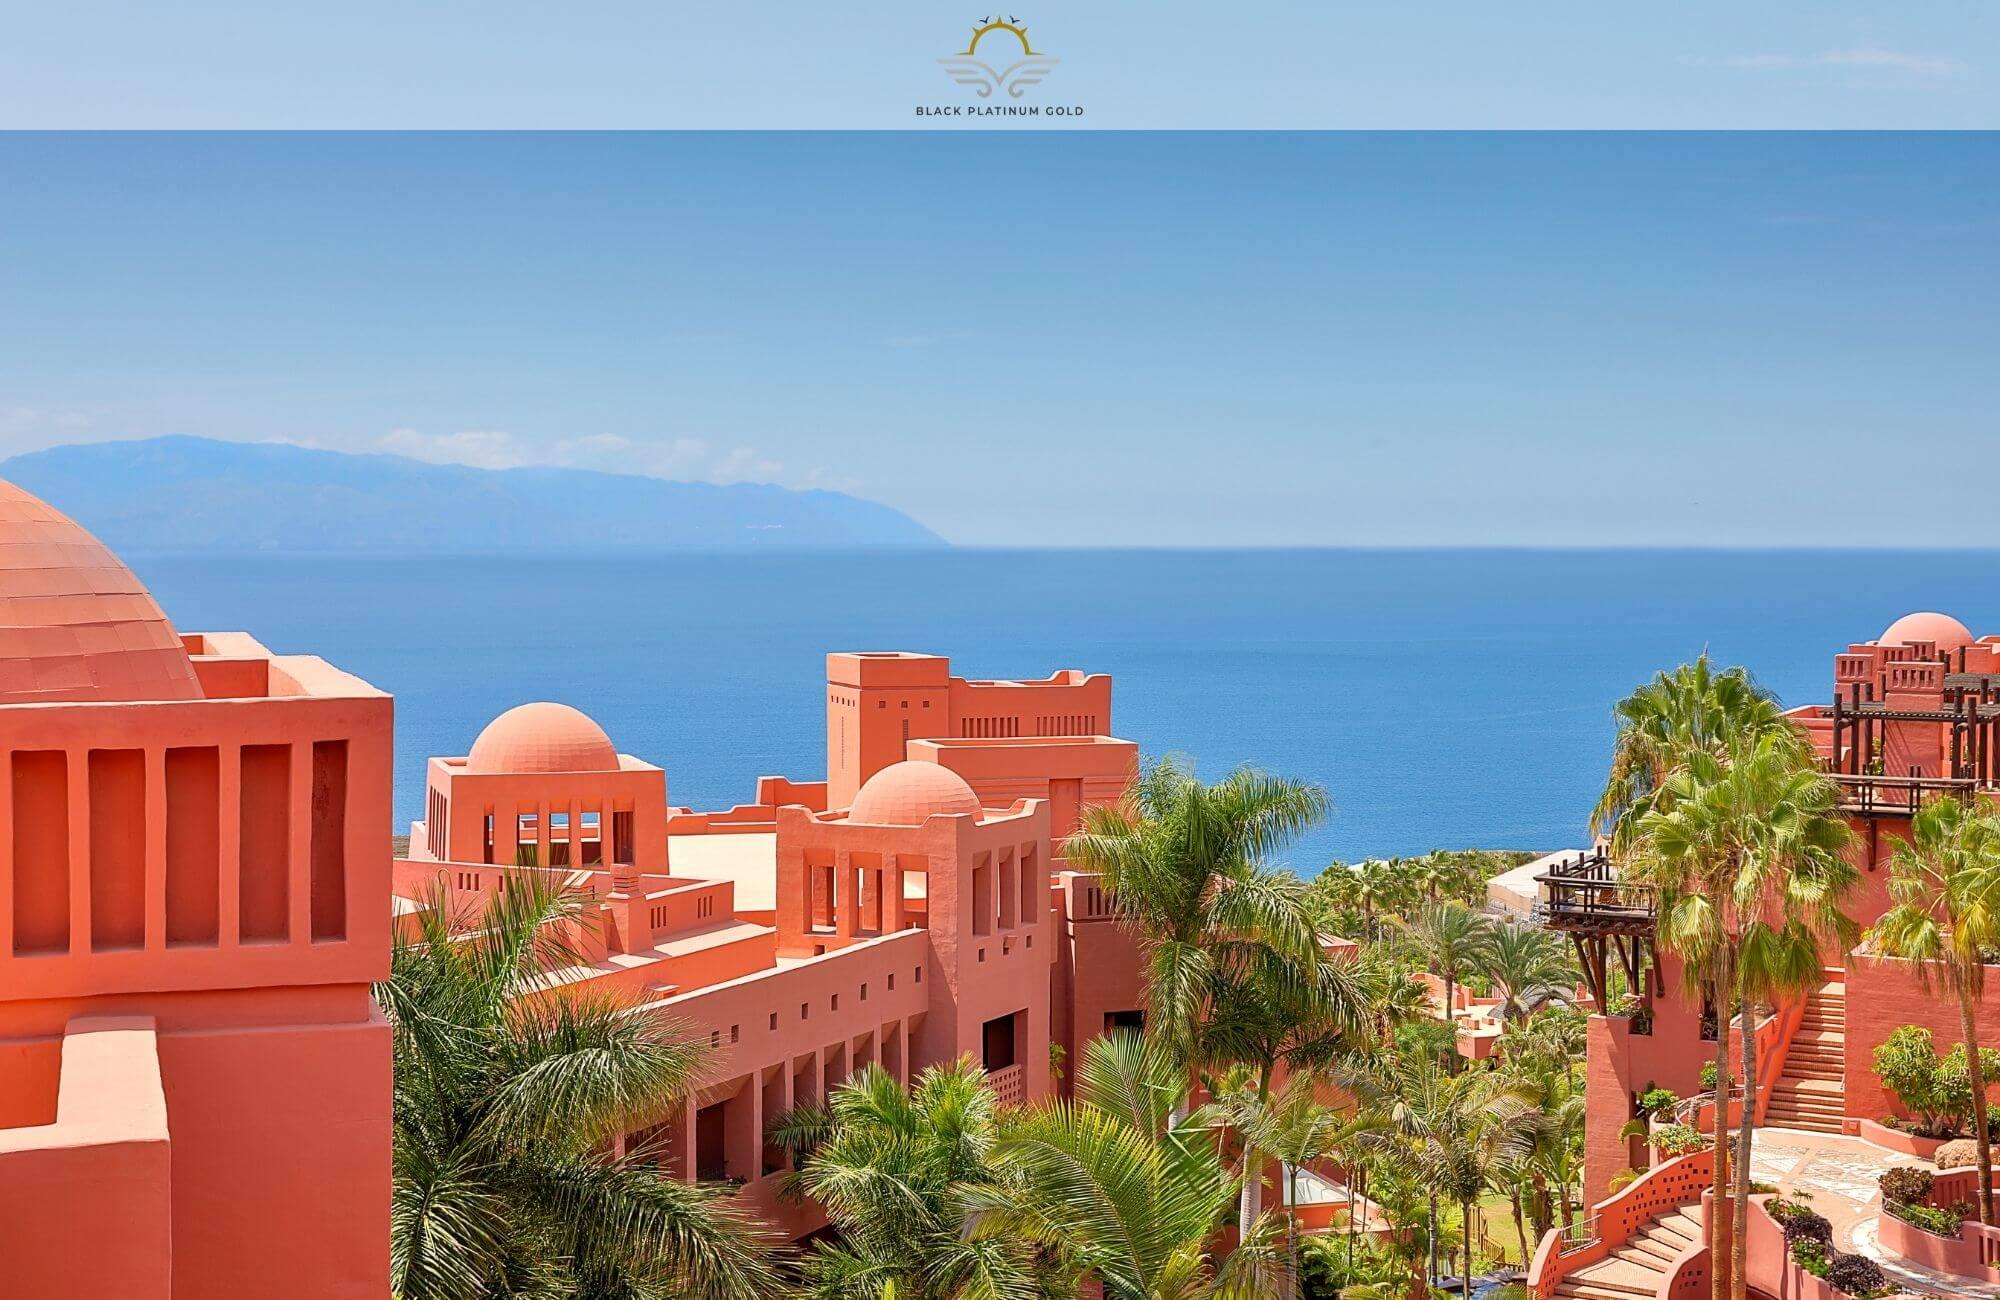 Tenerife – 2 Nights at The Ritz-Carlton Abama Canary Islands